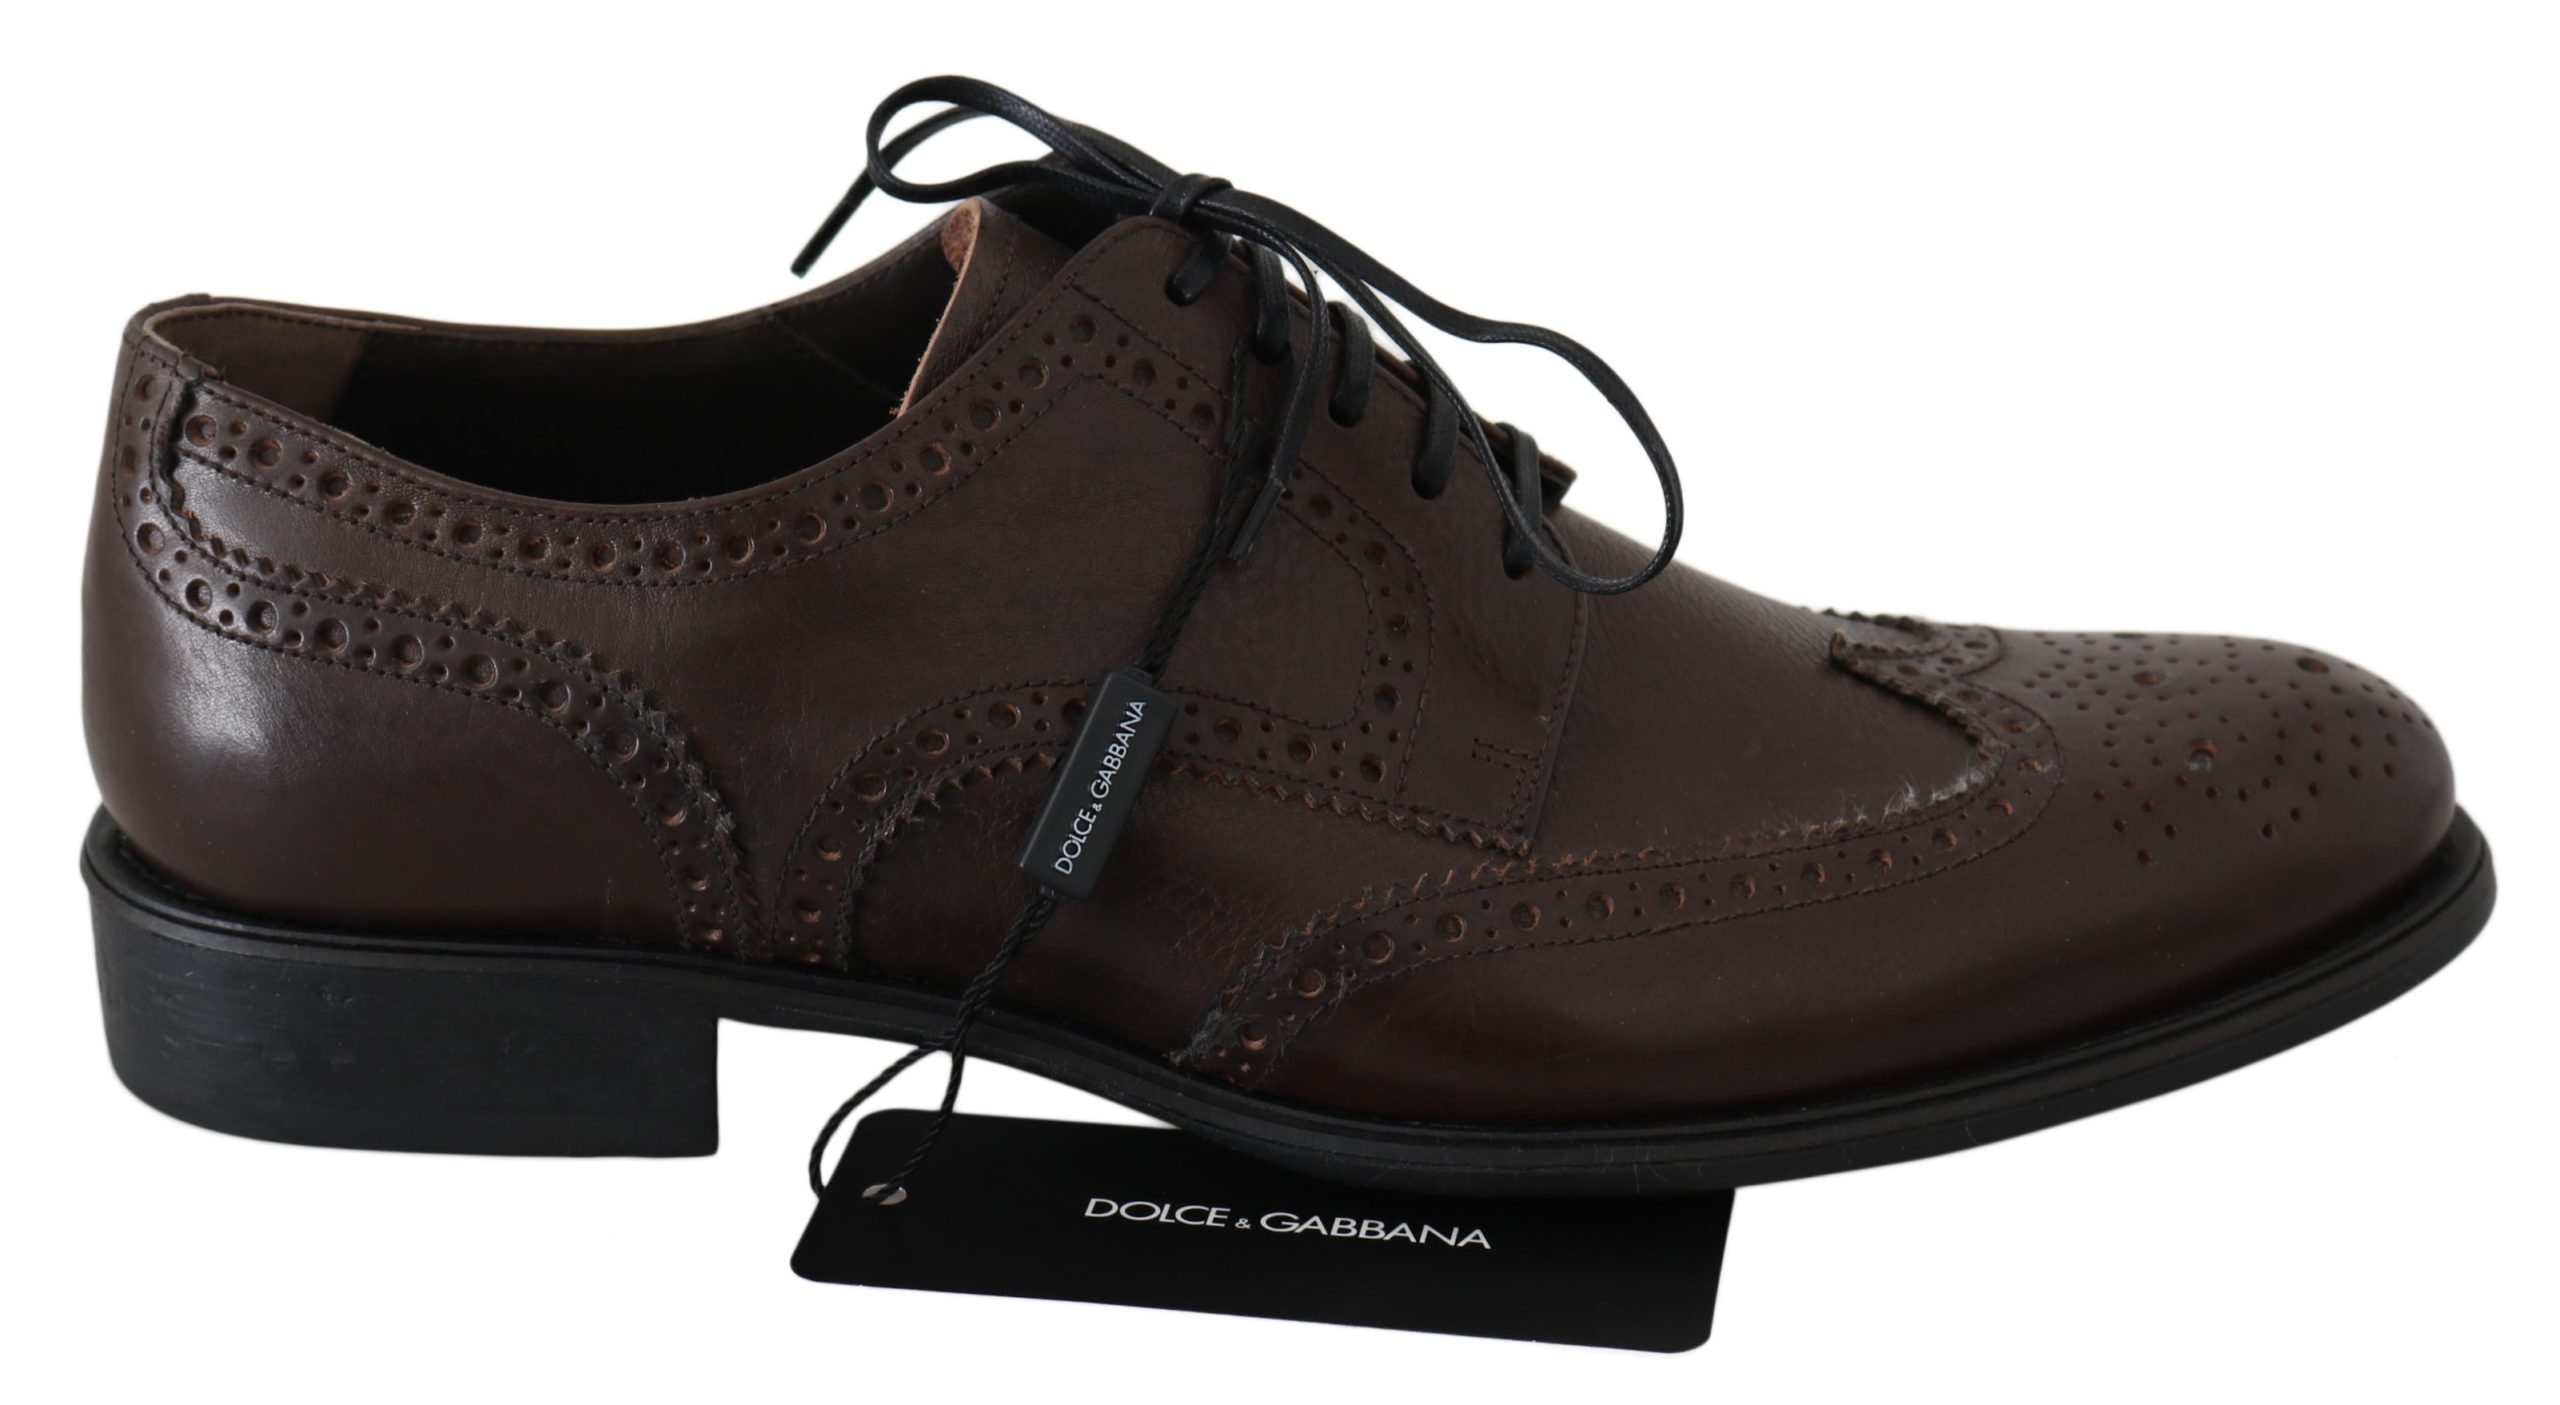 Dolce & Gabbana Men's Leather Brogue Shoes Brown MV2469 - EU39/US6